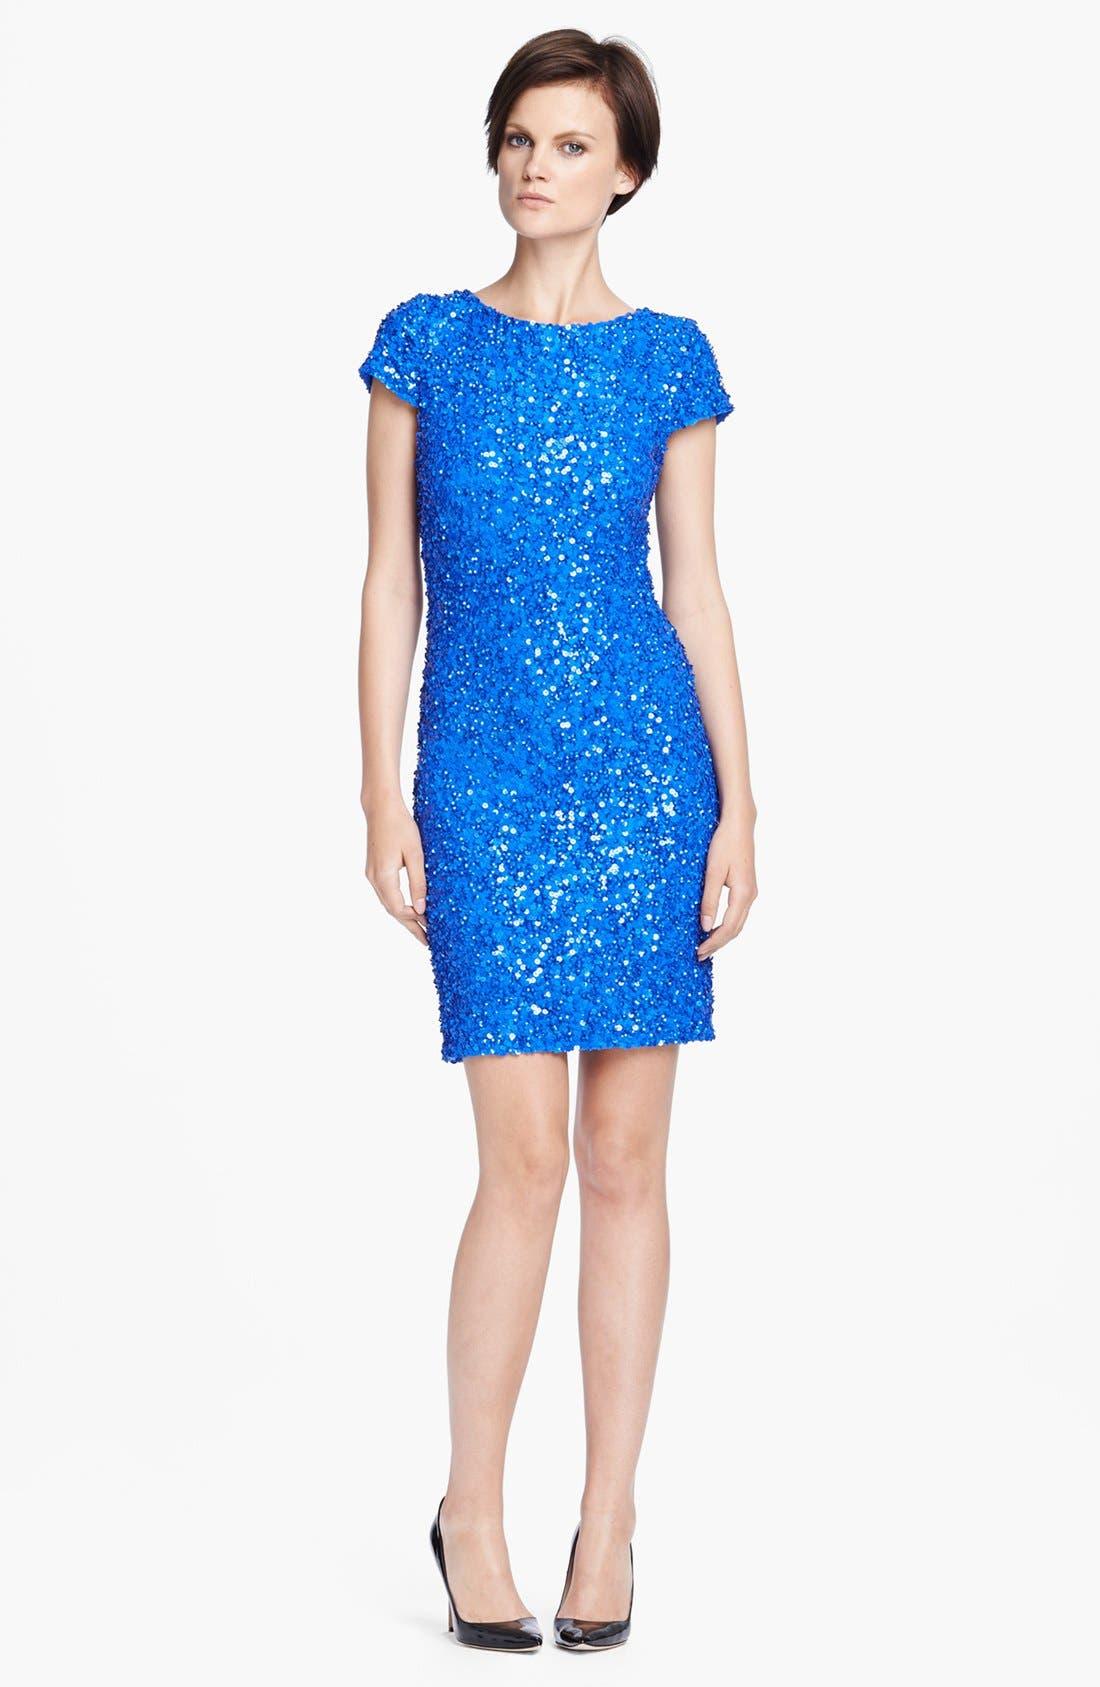 Alternate Image 1 Selected - Alice + Olivia 'Taryn' Sequin Dress